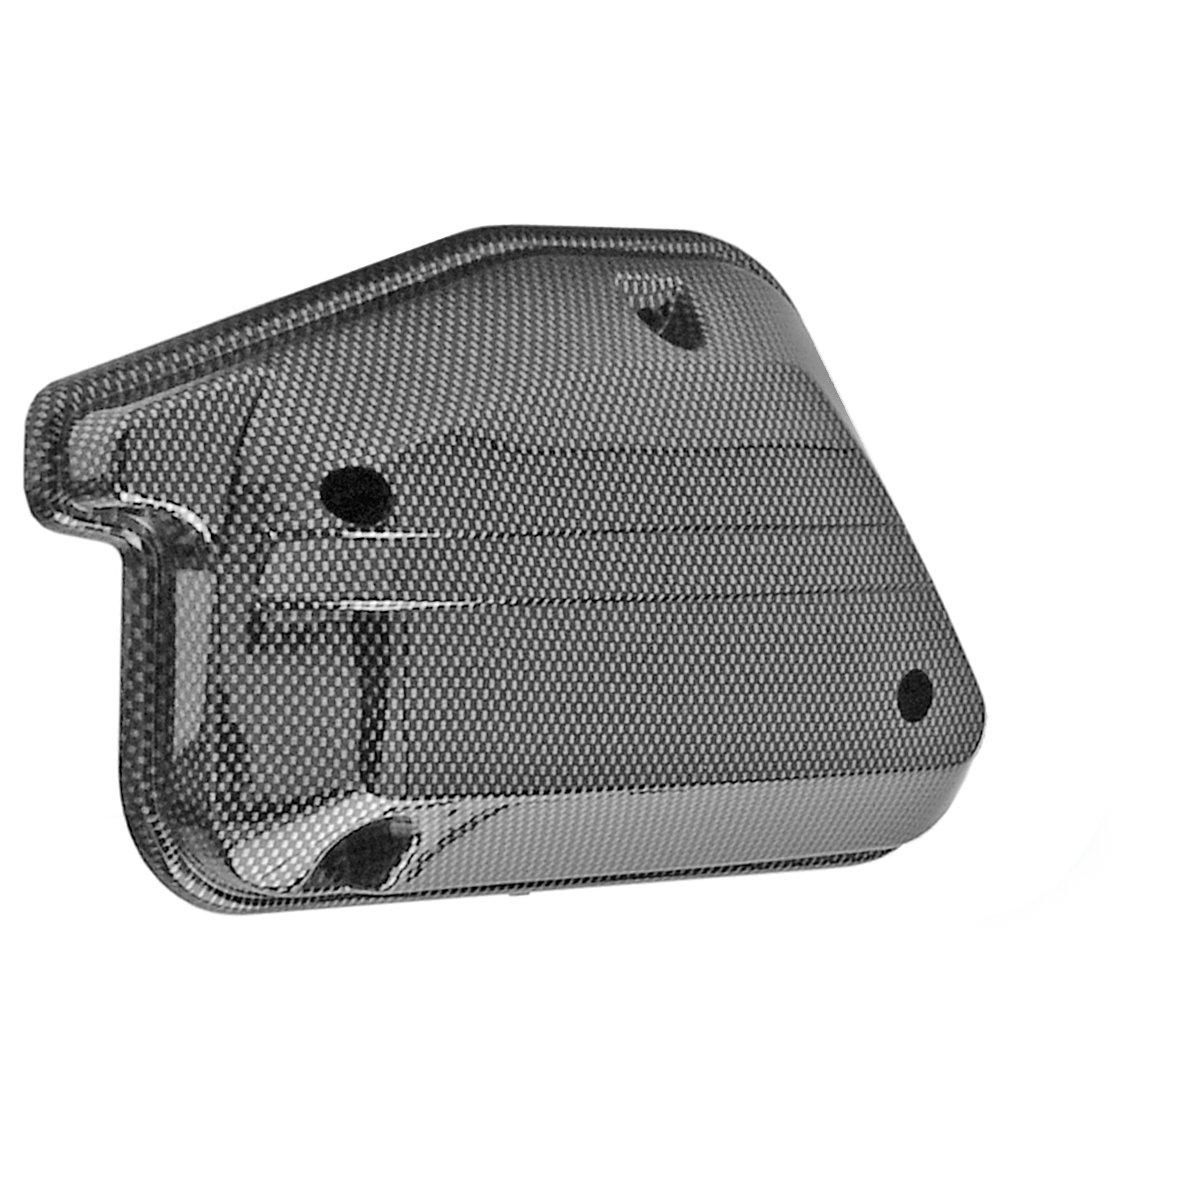 tnttu coperchio filtro aria adattatore Booster, imit carbonio SACIM Distribution 114055